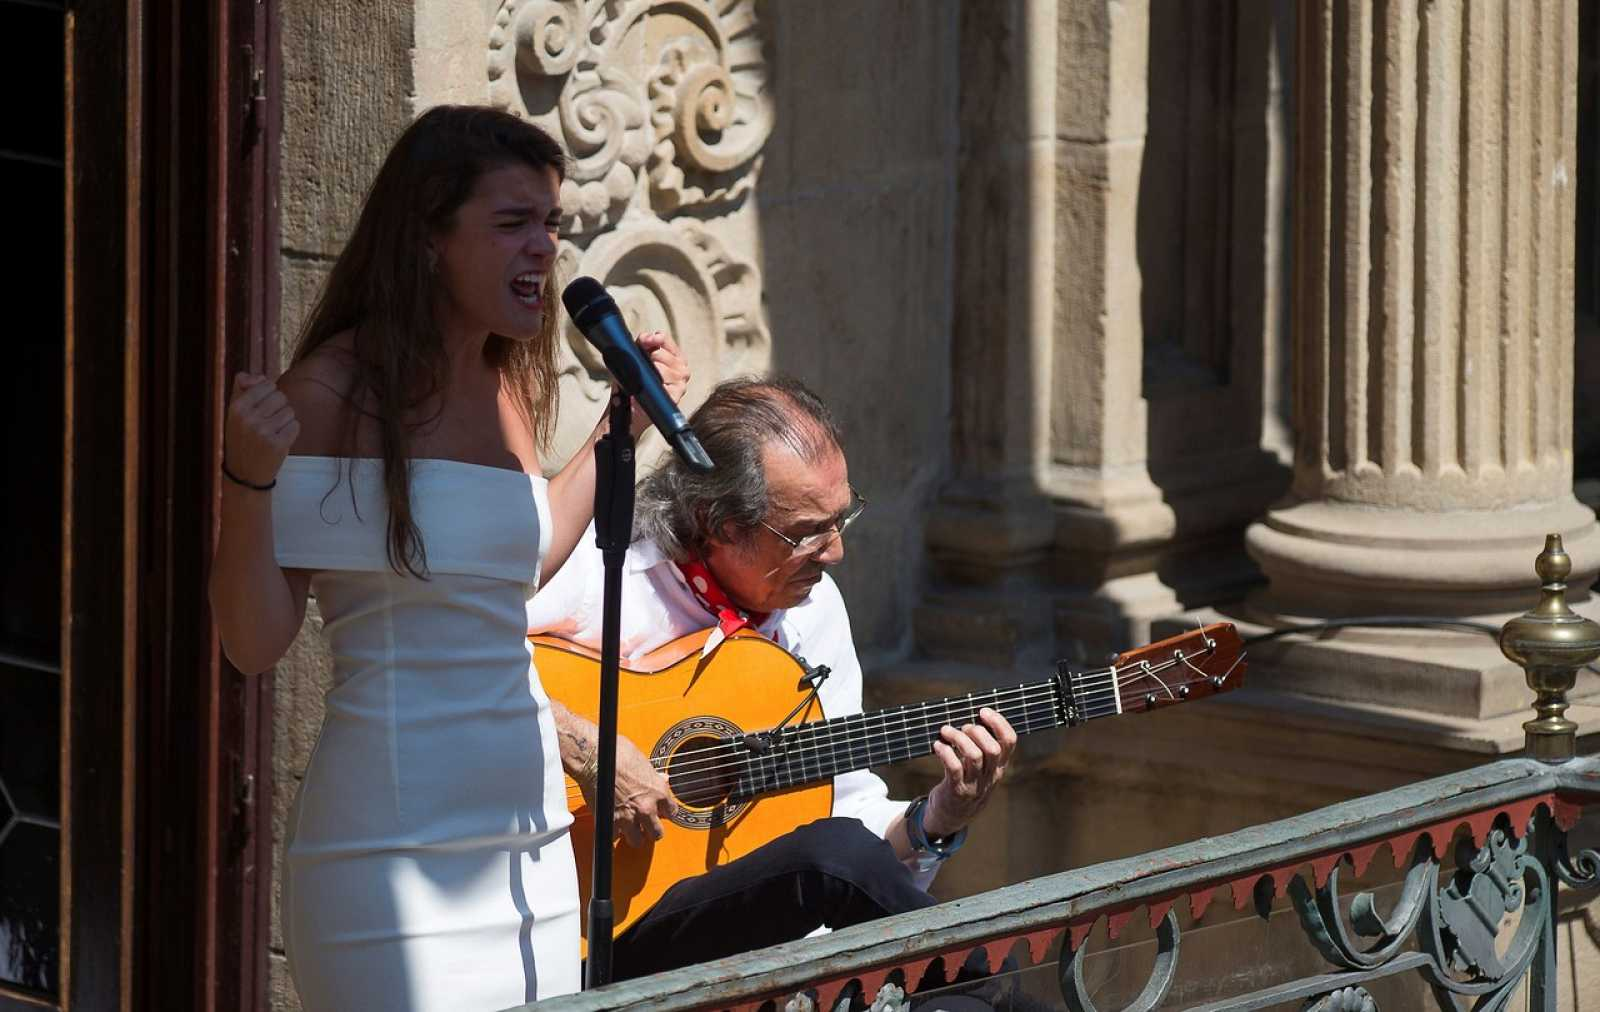 Telediario - Amaia inagura el festival 'Flamenco on fire' de Pamplona